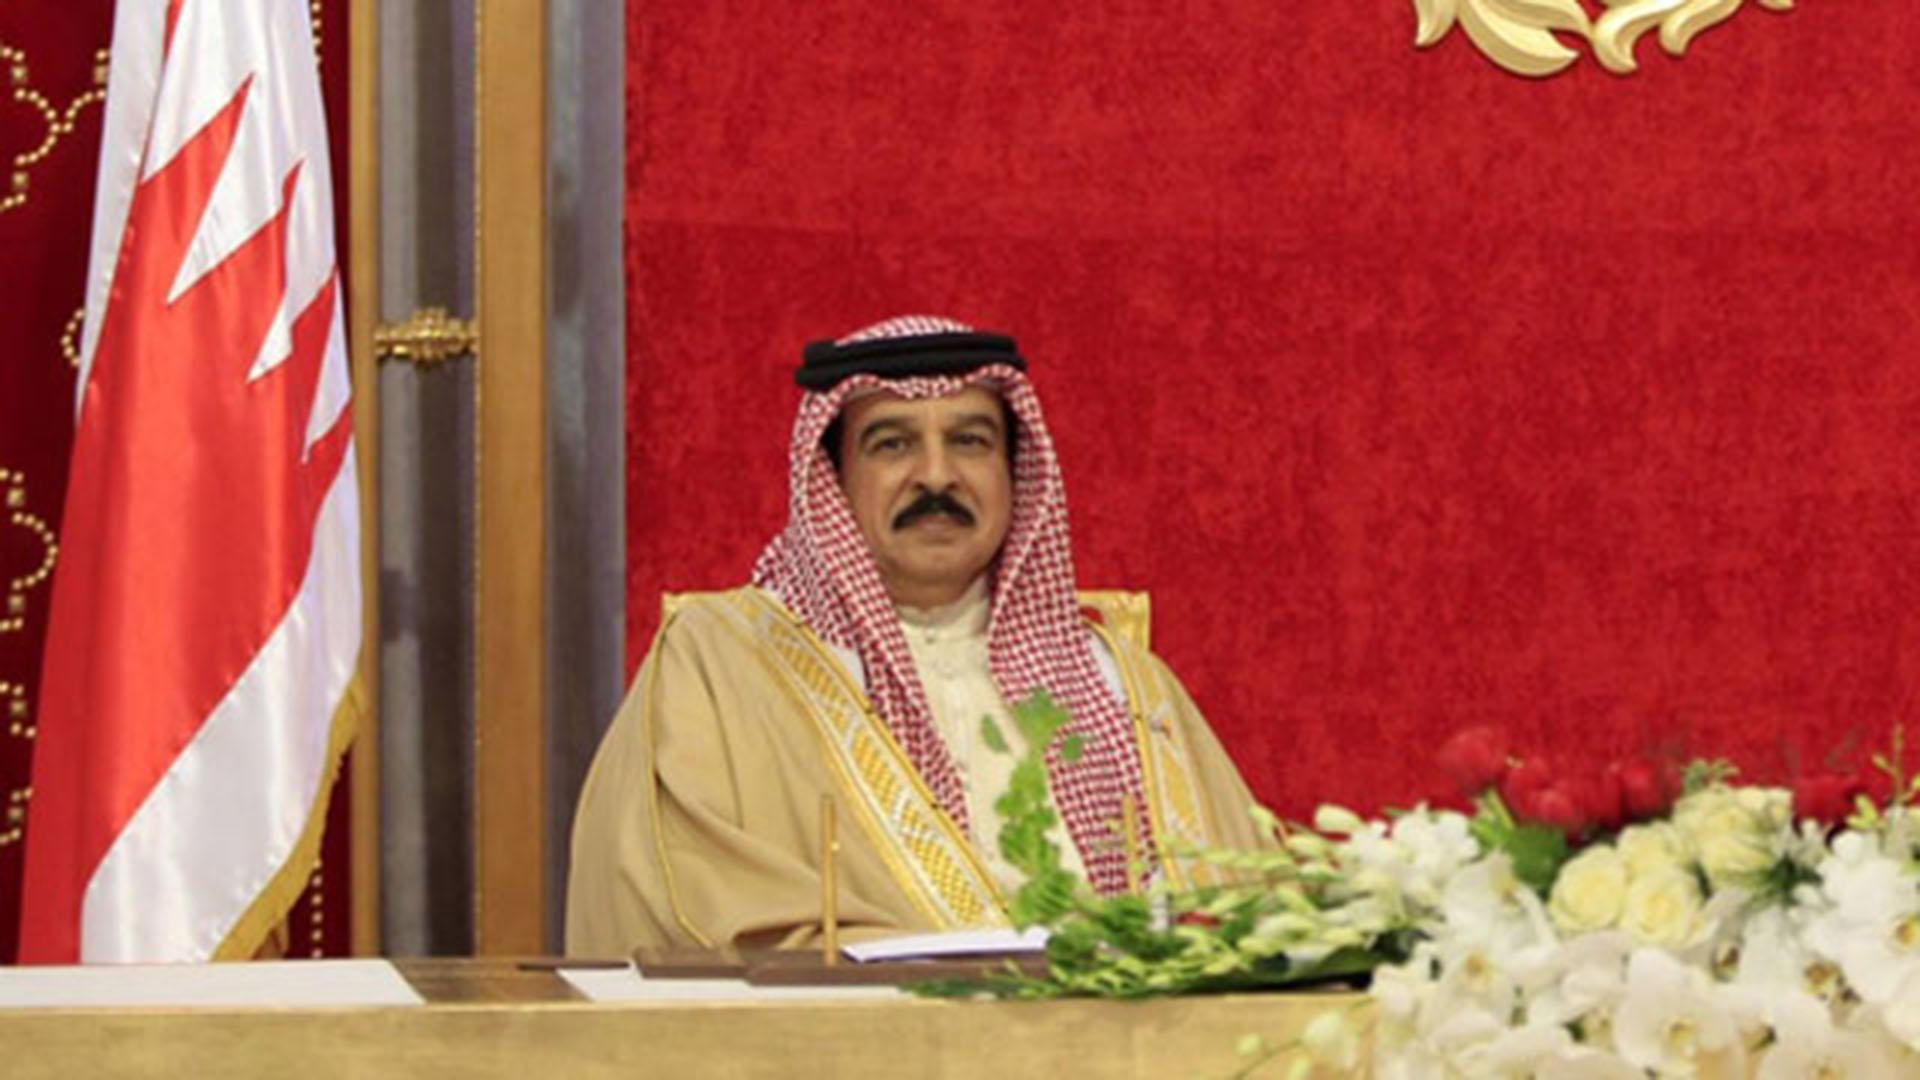 Hamad bin Isa Al Jalifa, rey de Bahréin